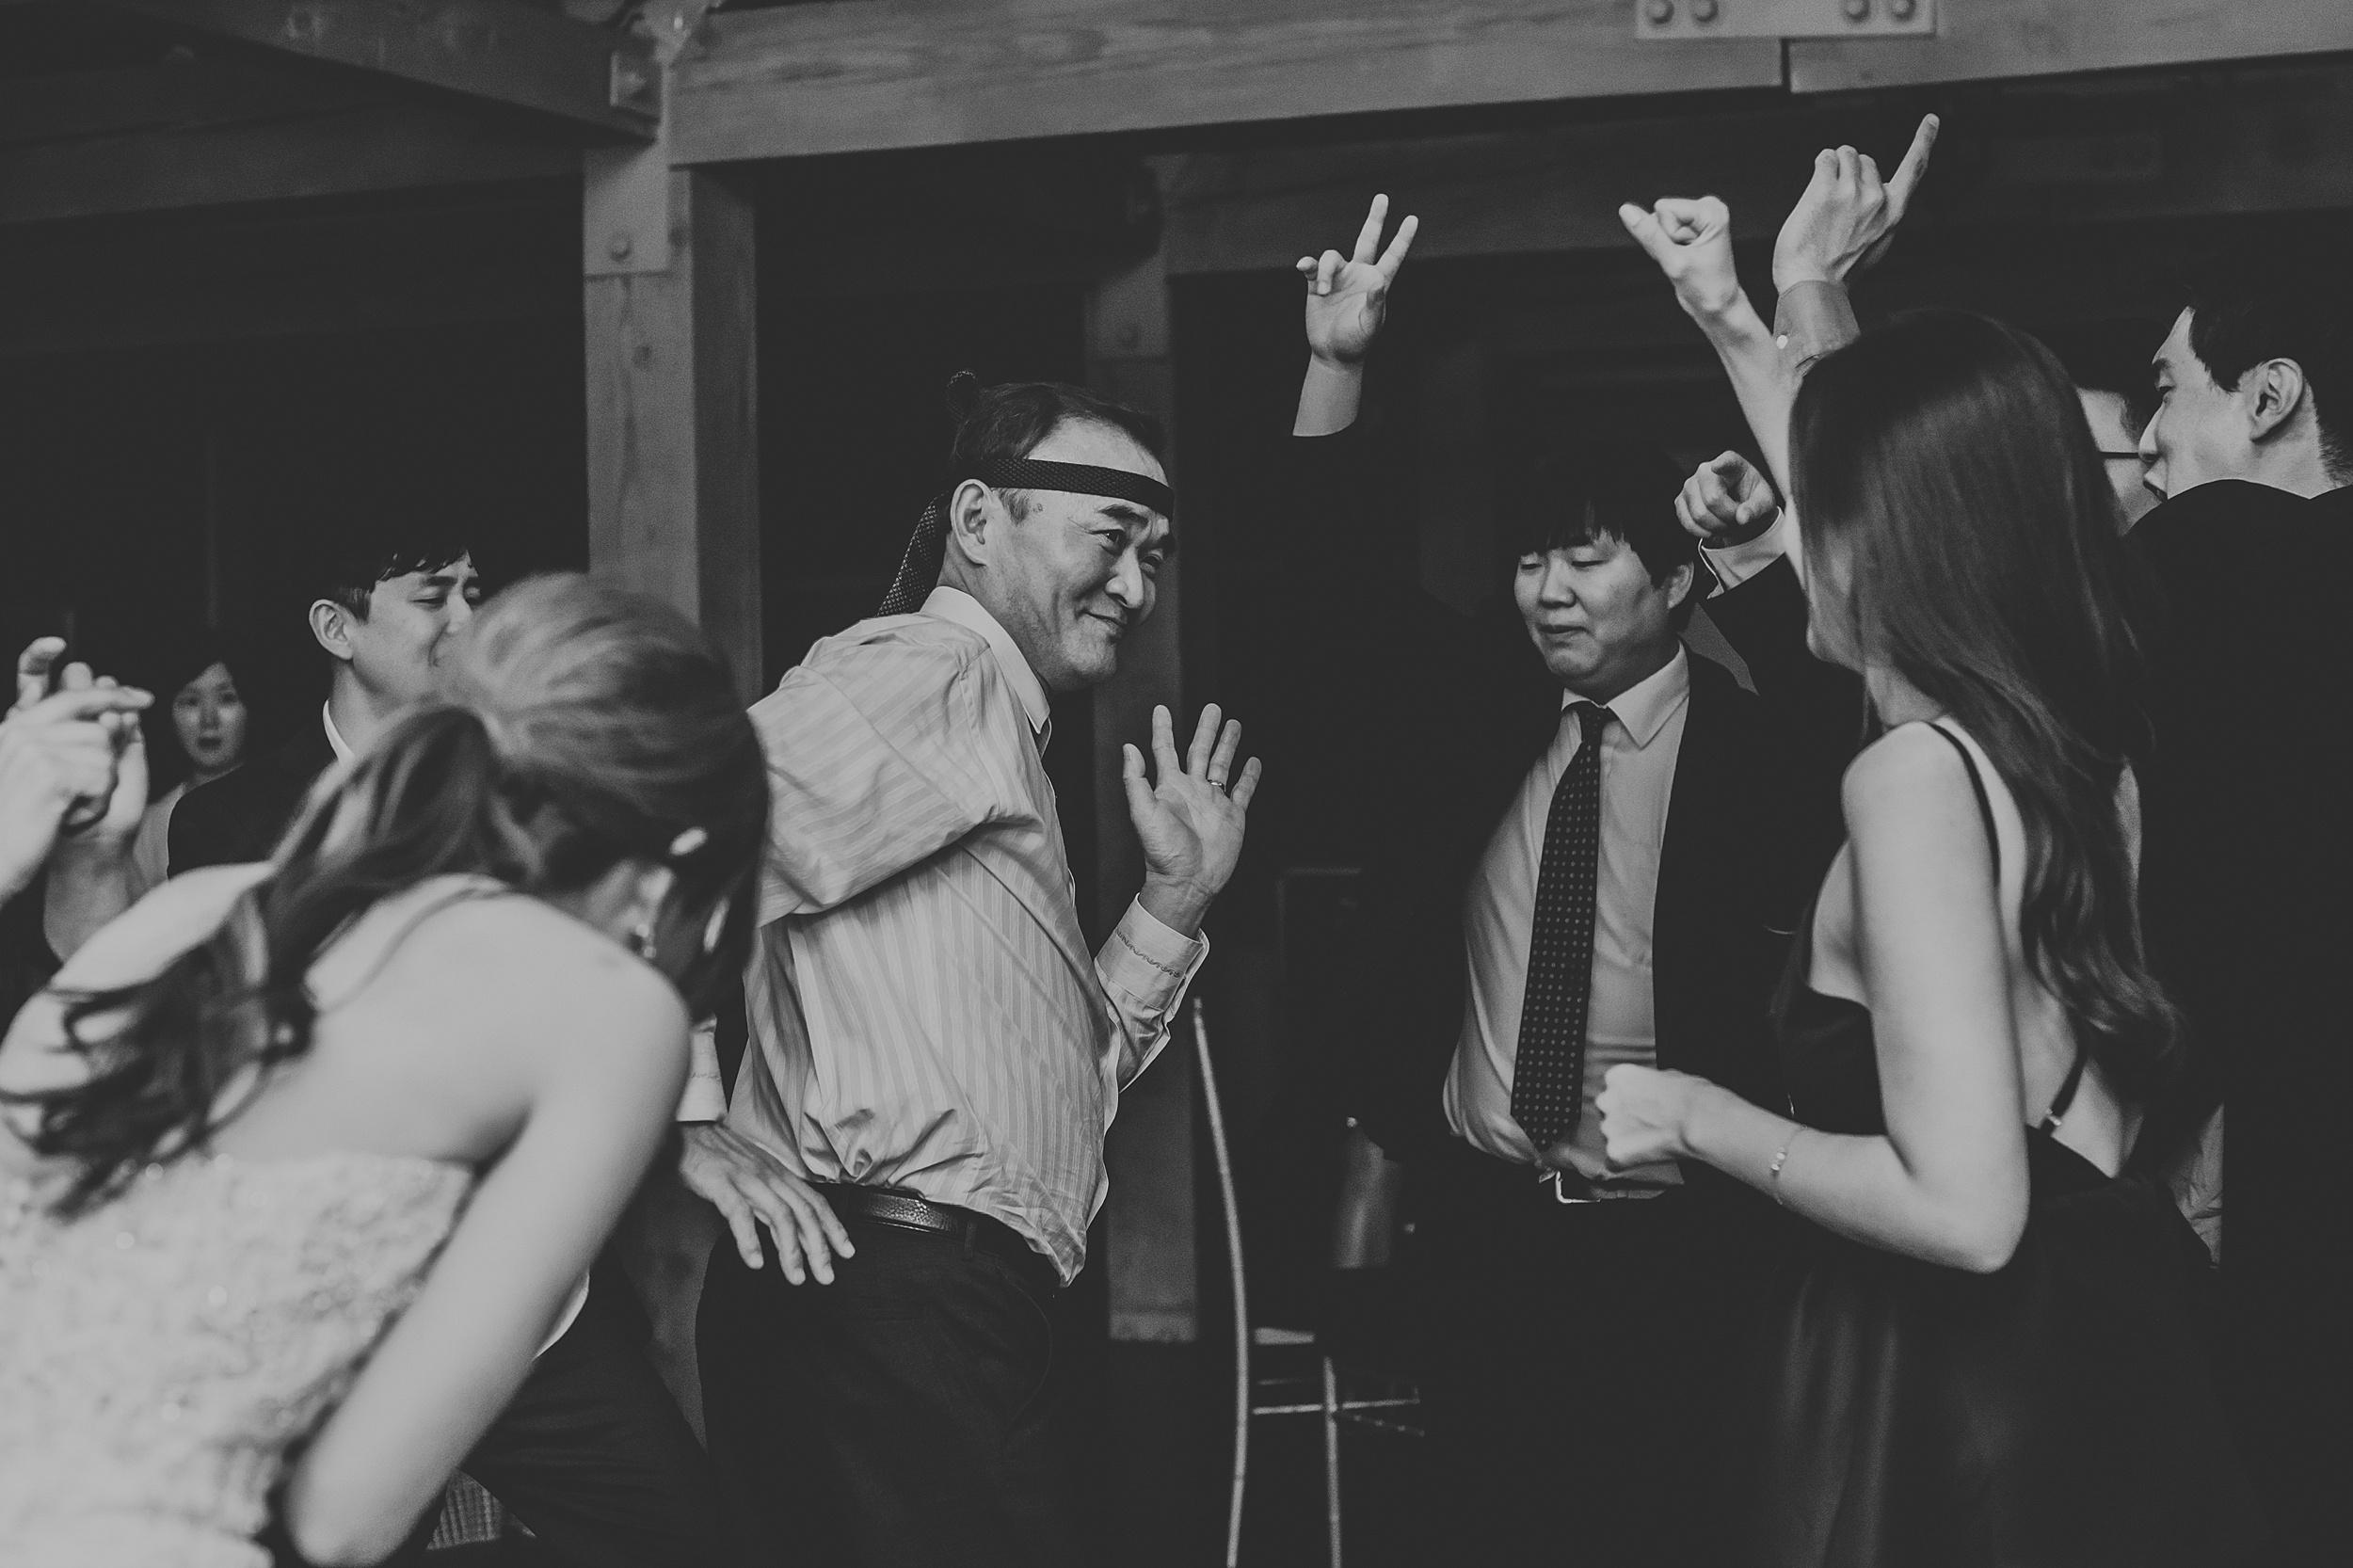 Doctors_House_Kleinburg_Wedding_Toronto_Photographer_0134.jpg